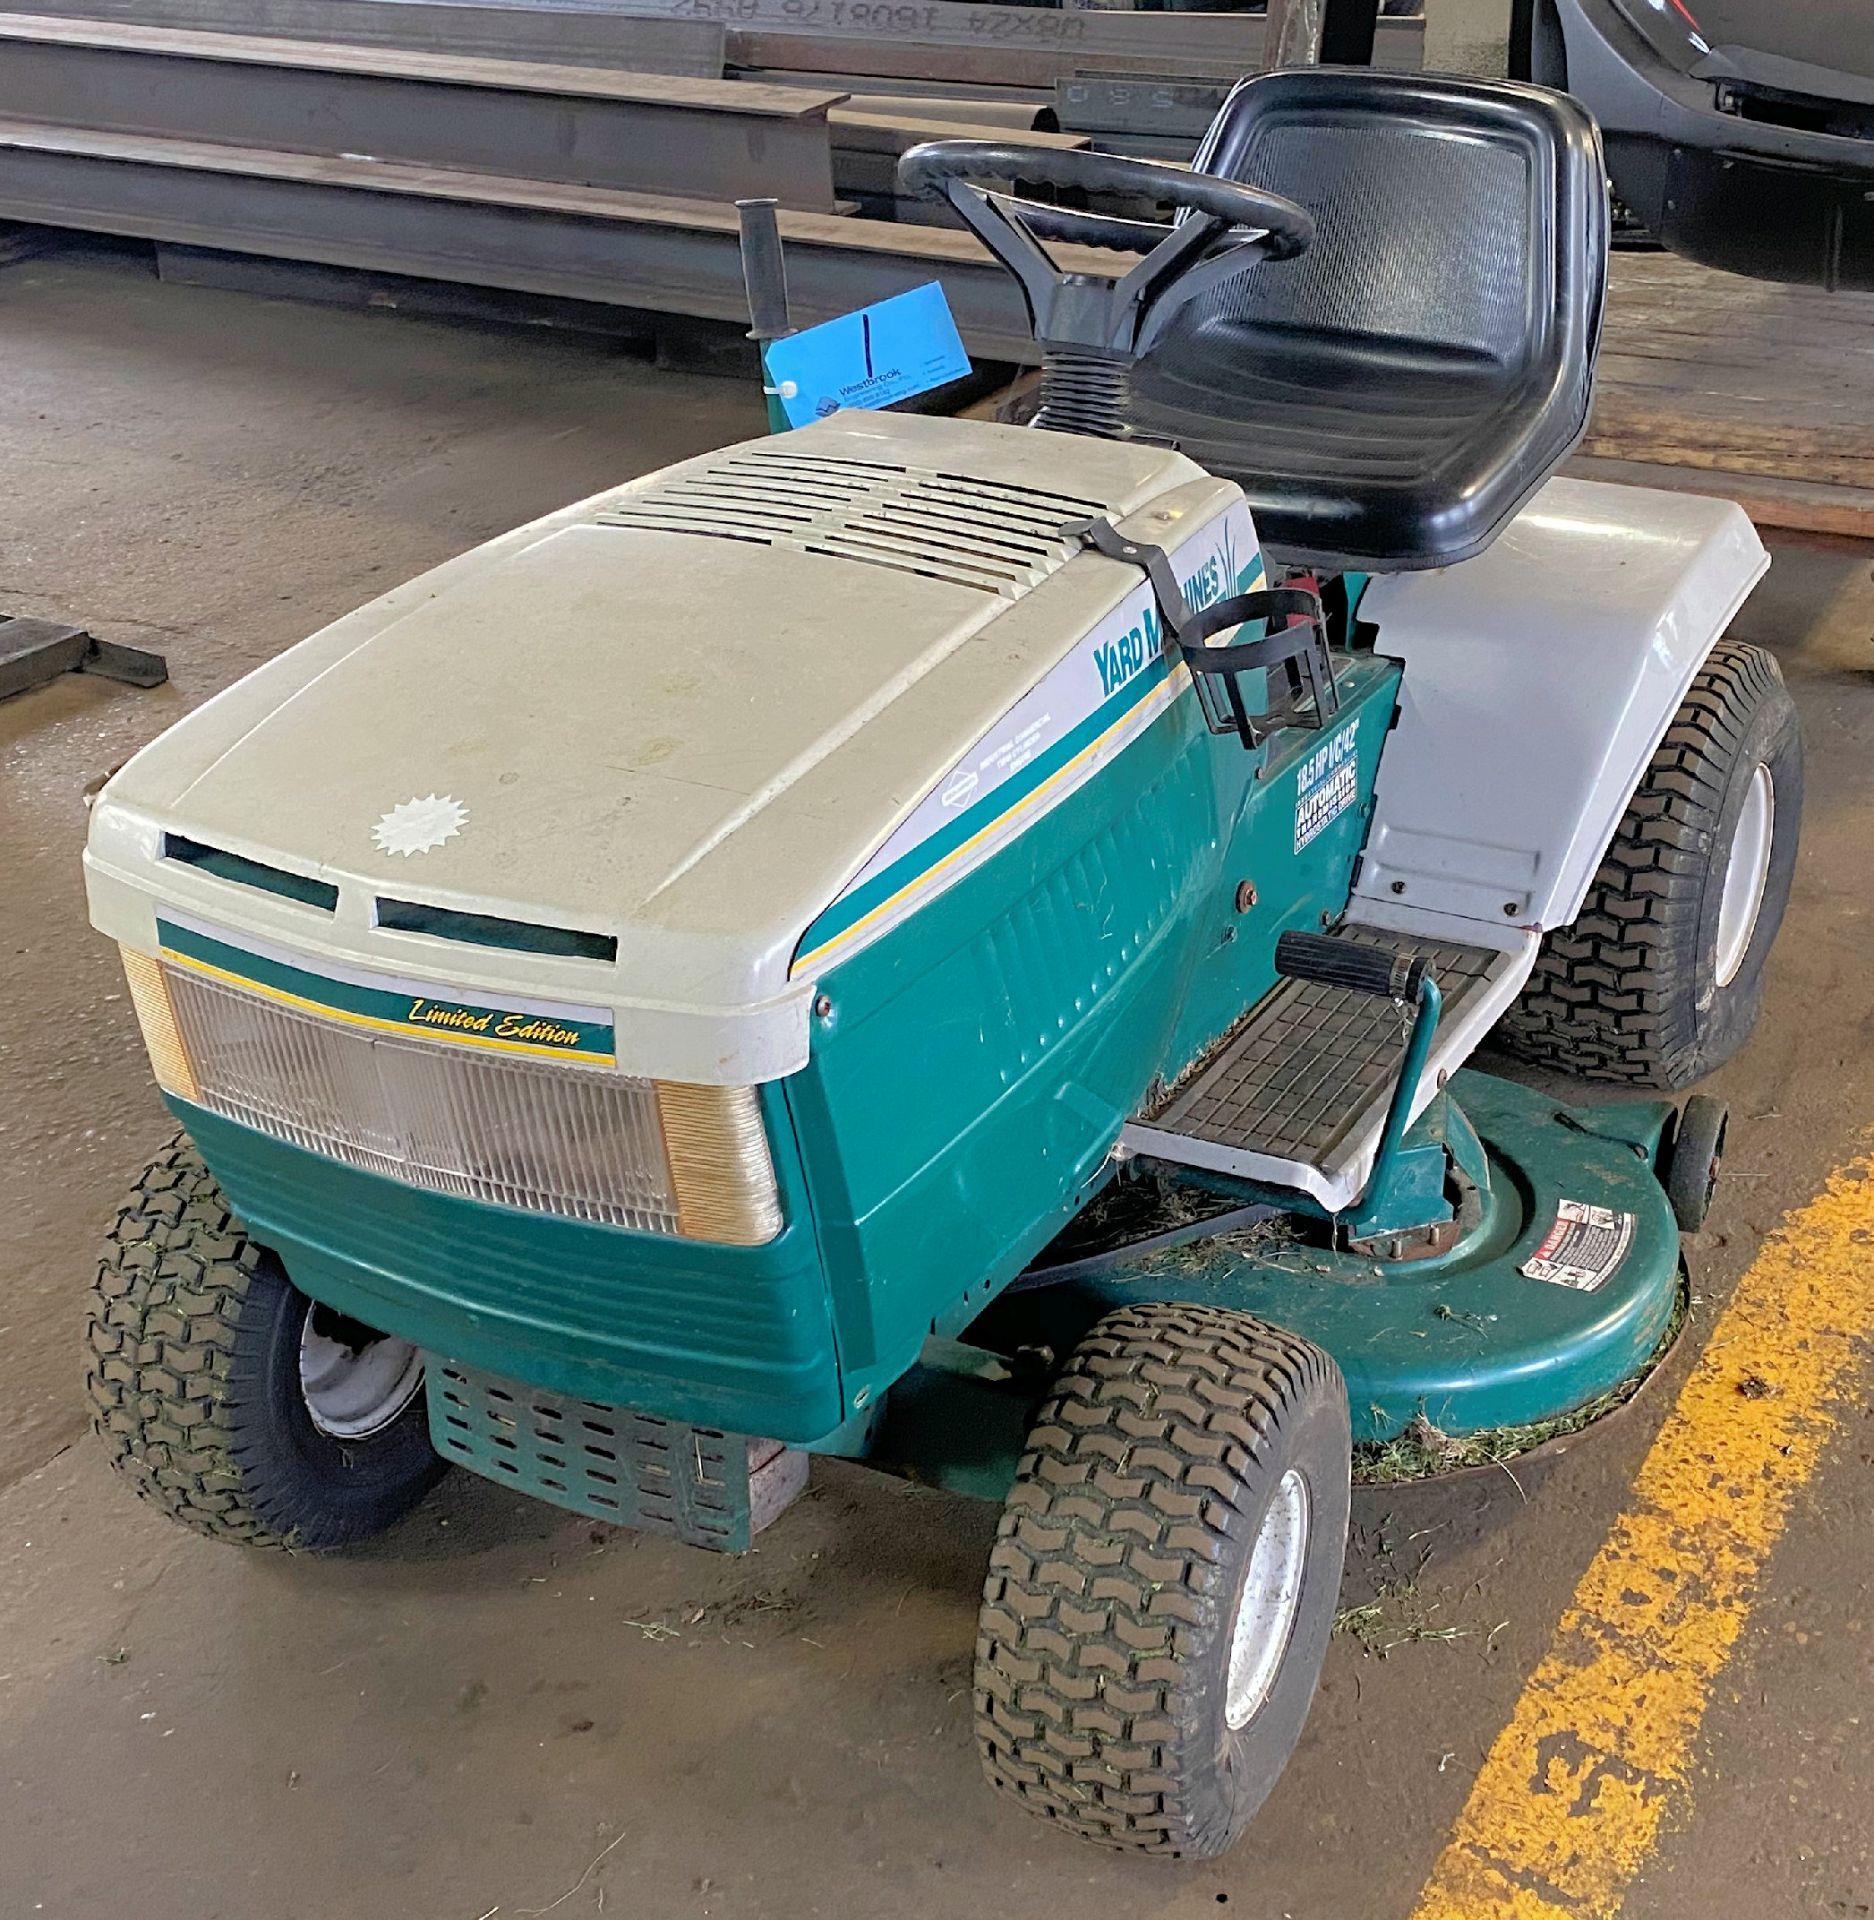 "MTD Yard Machine 18.5-HP x 42"" Cut, Gas Powered Riding Lawn Mower"